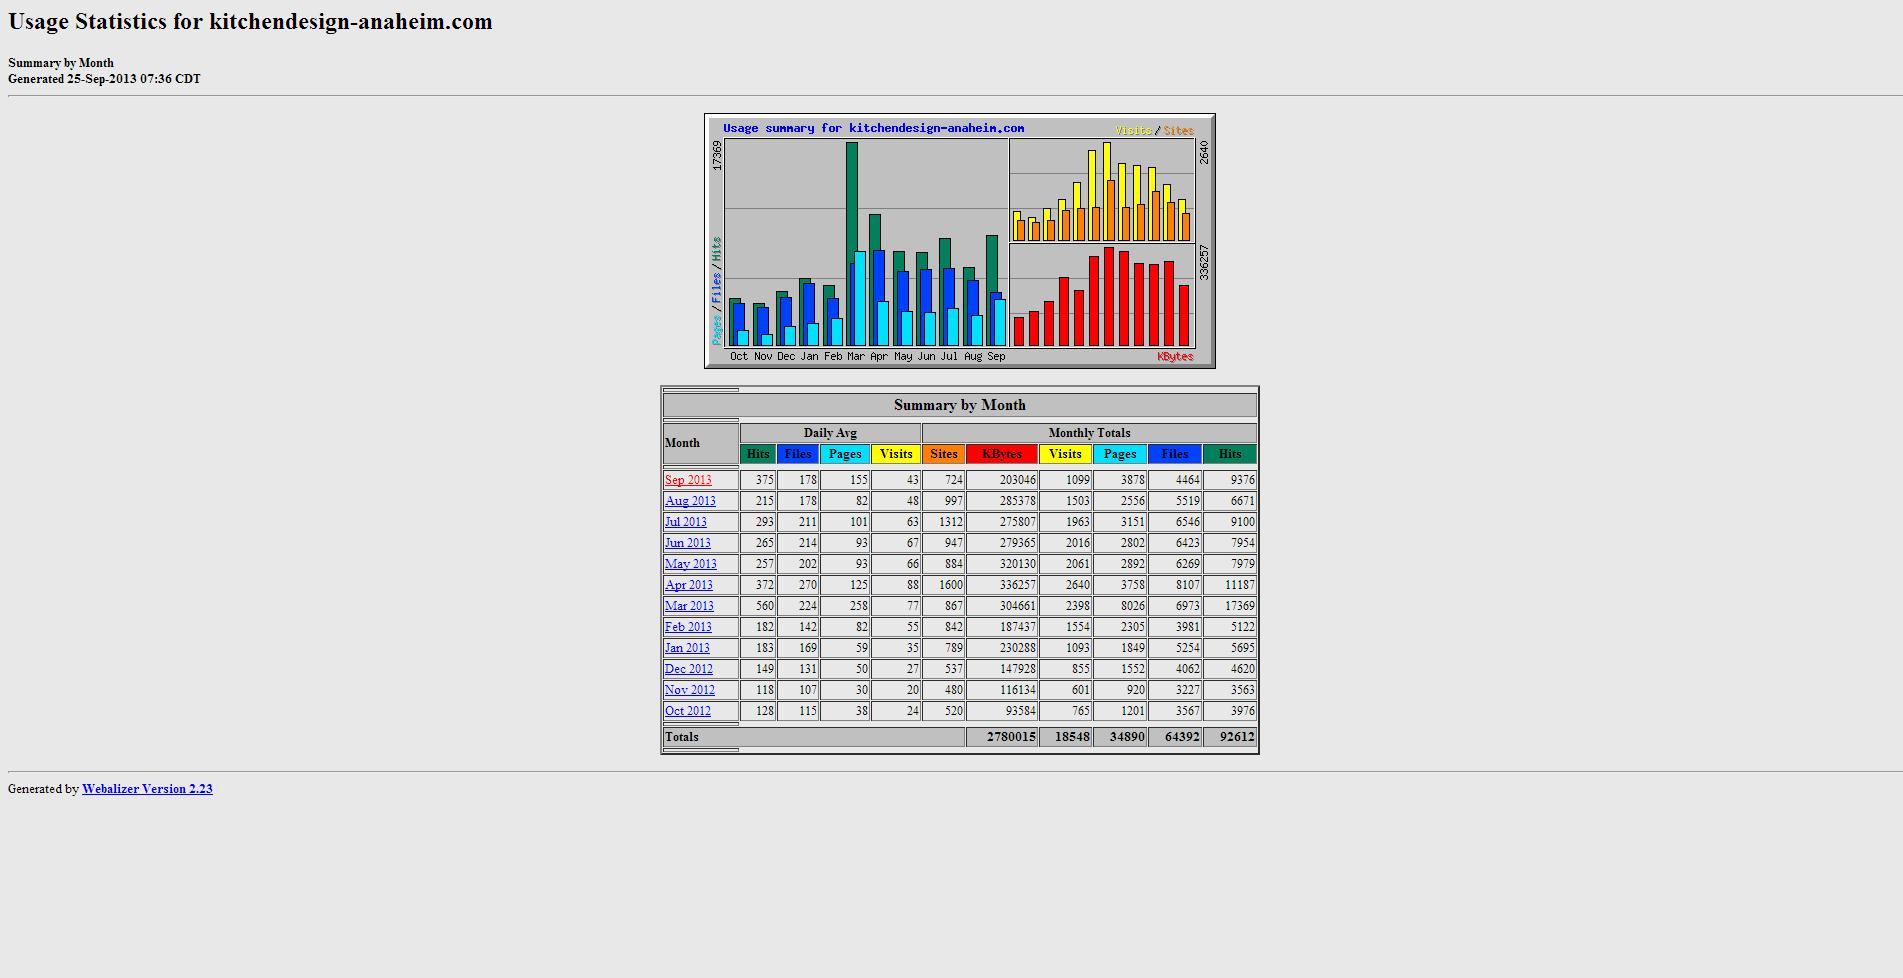 Usage Statistics for kitchendesign anaheim.com   Summary by Month